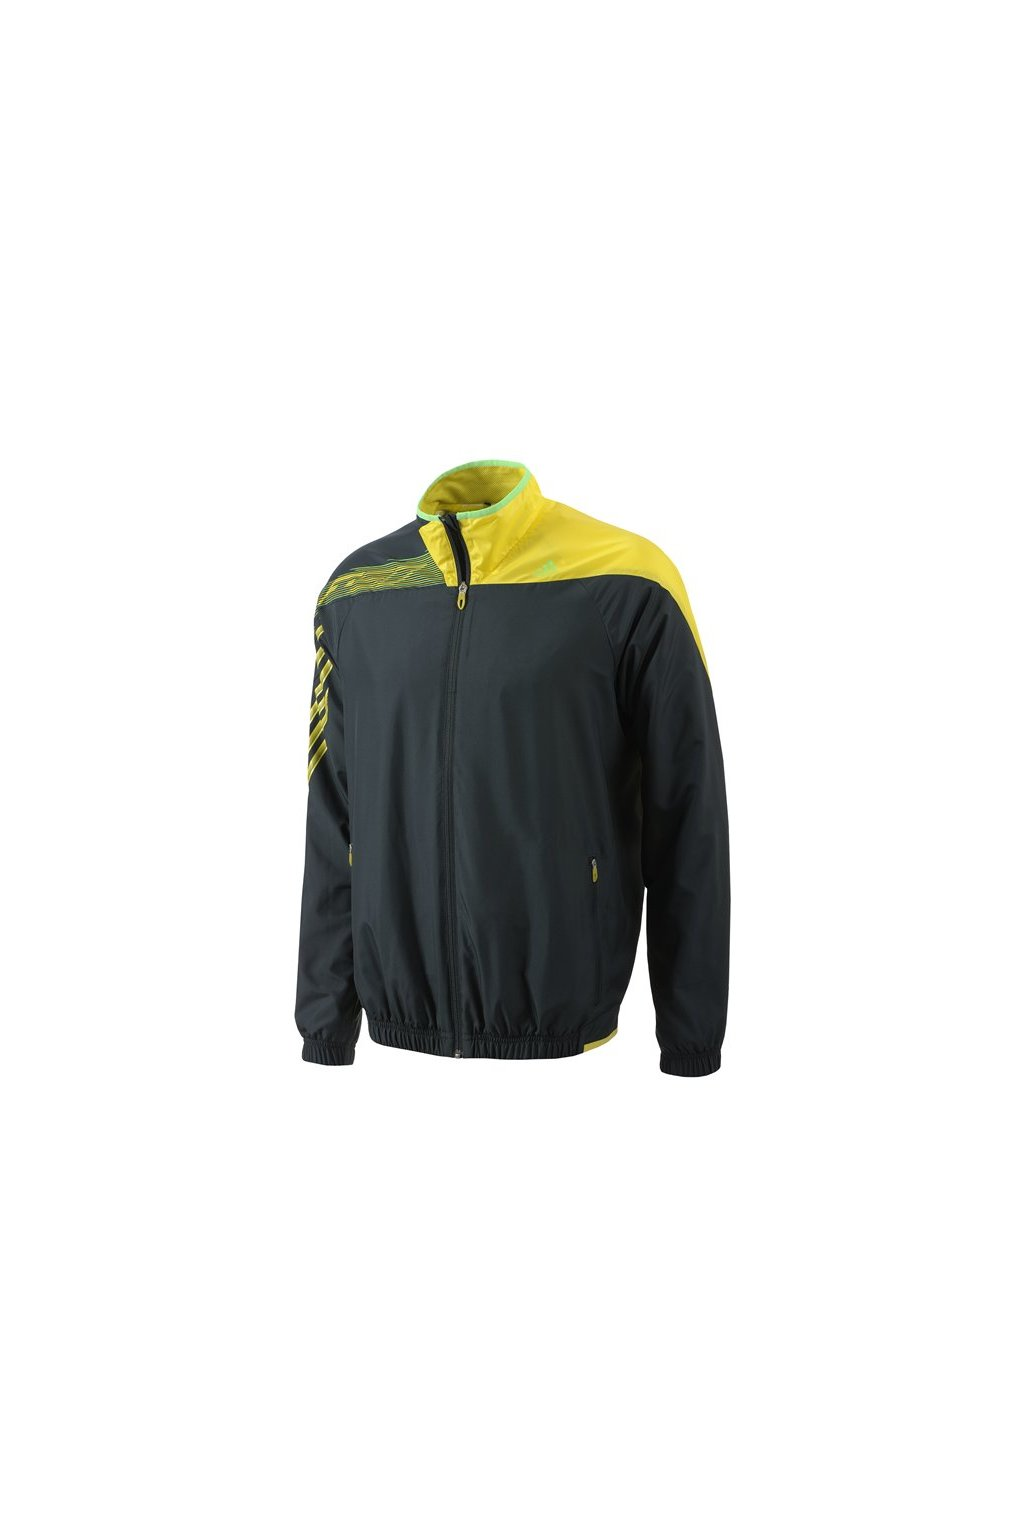 adidas F50 Woven Jacket Z10028